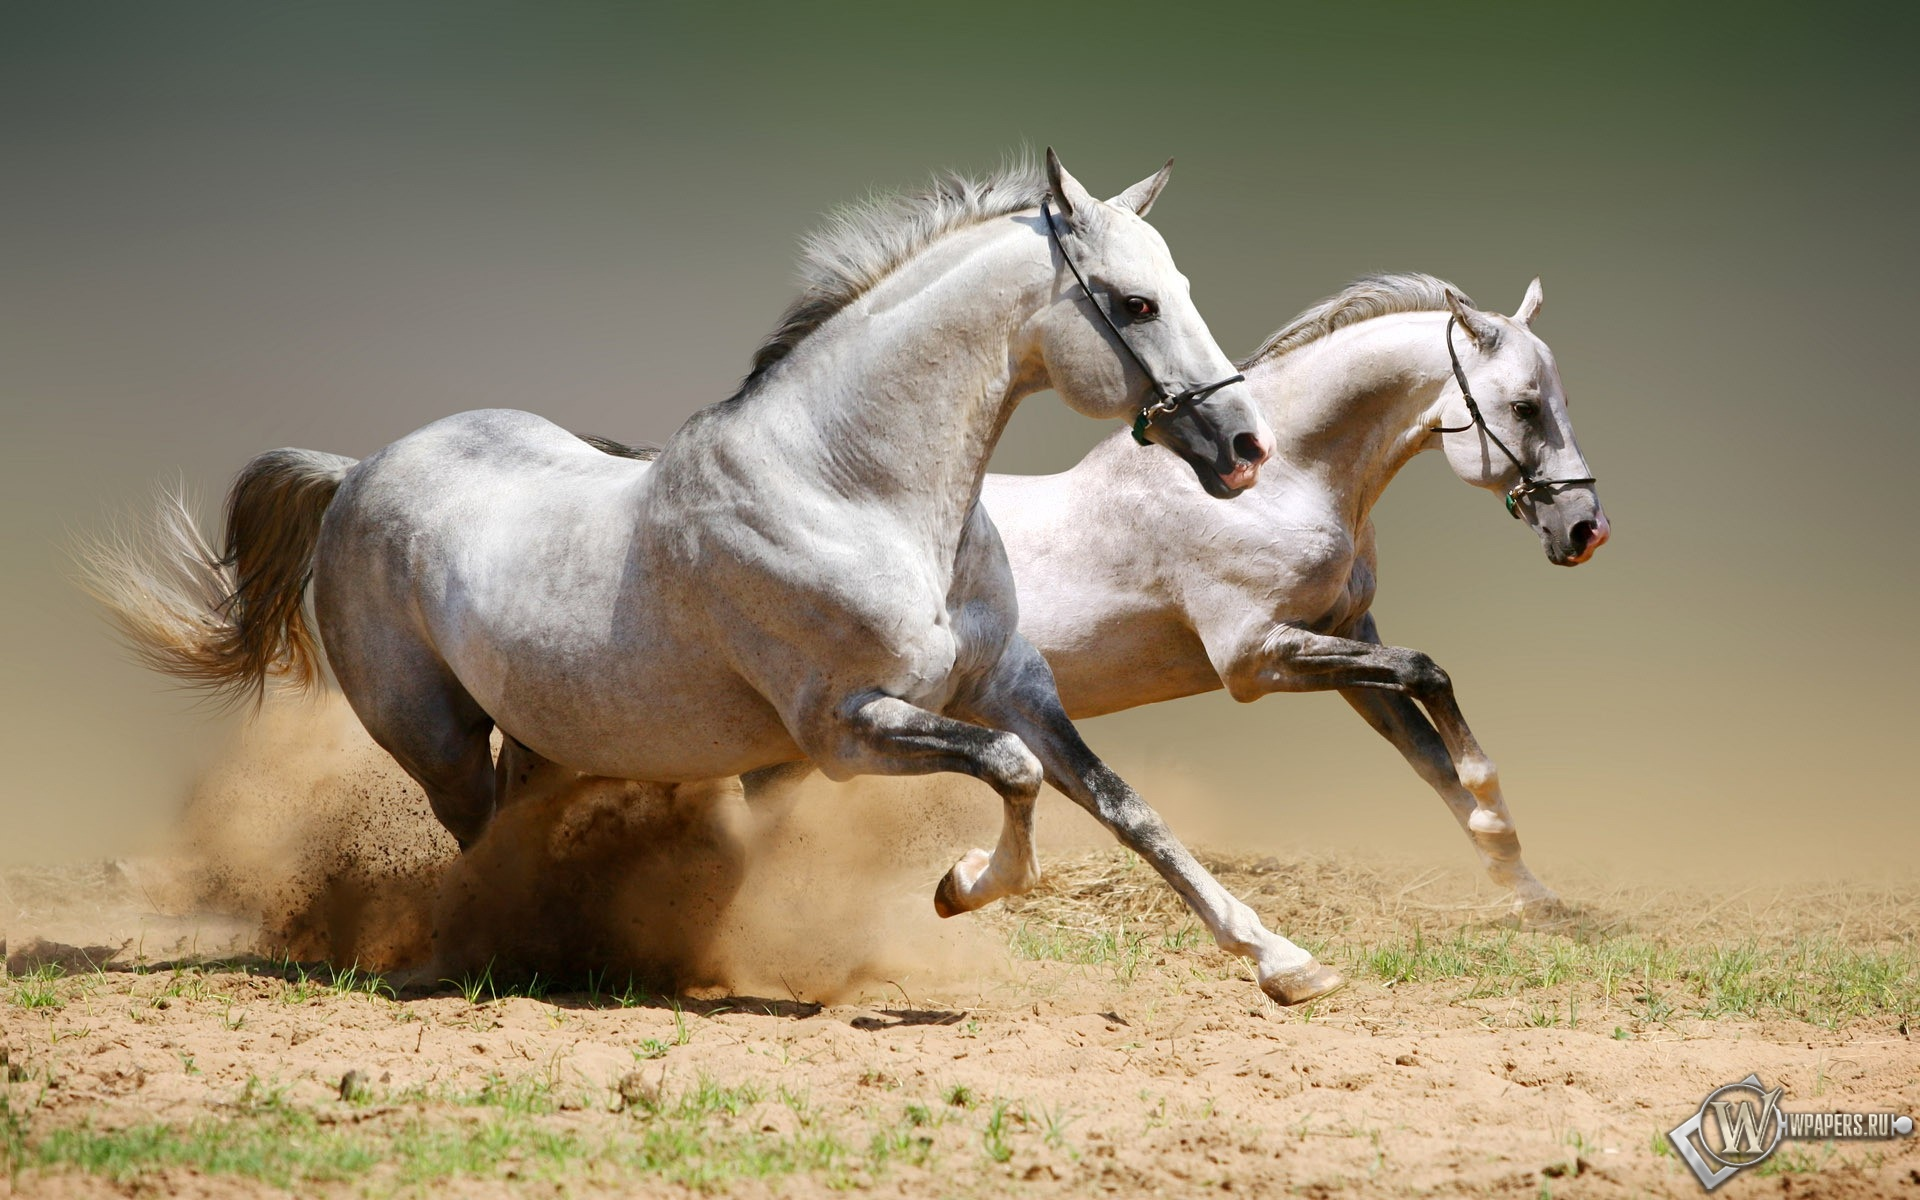 Бегущие белые лошади 1920x1200